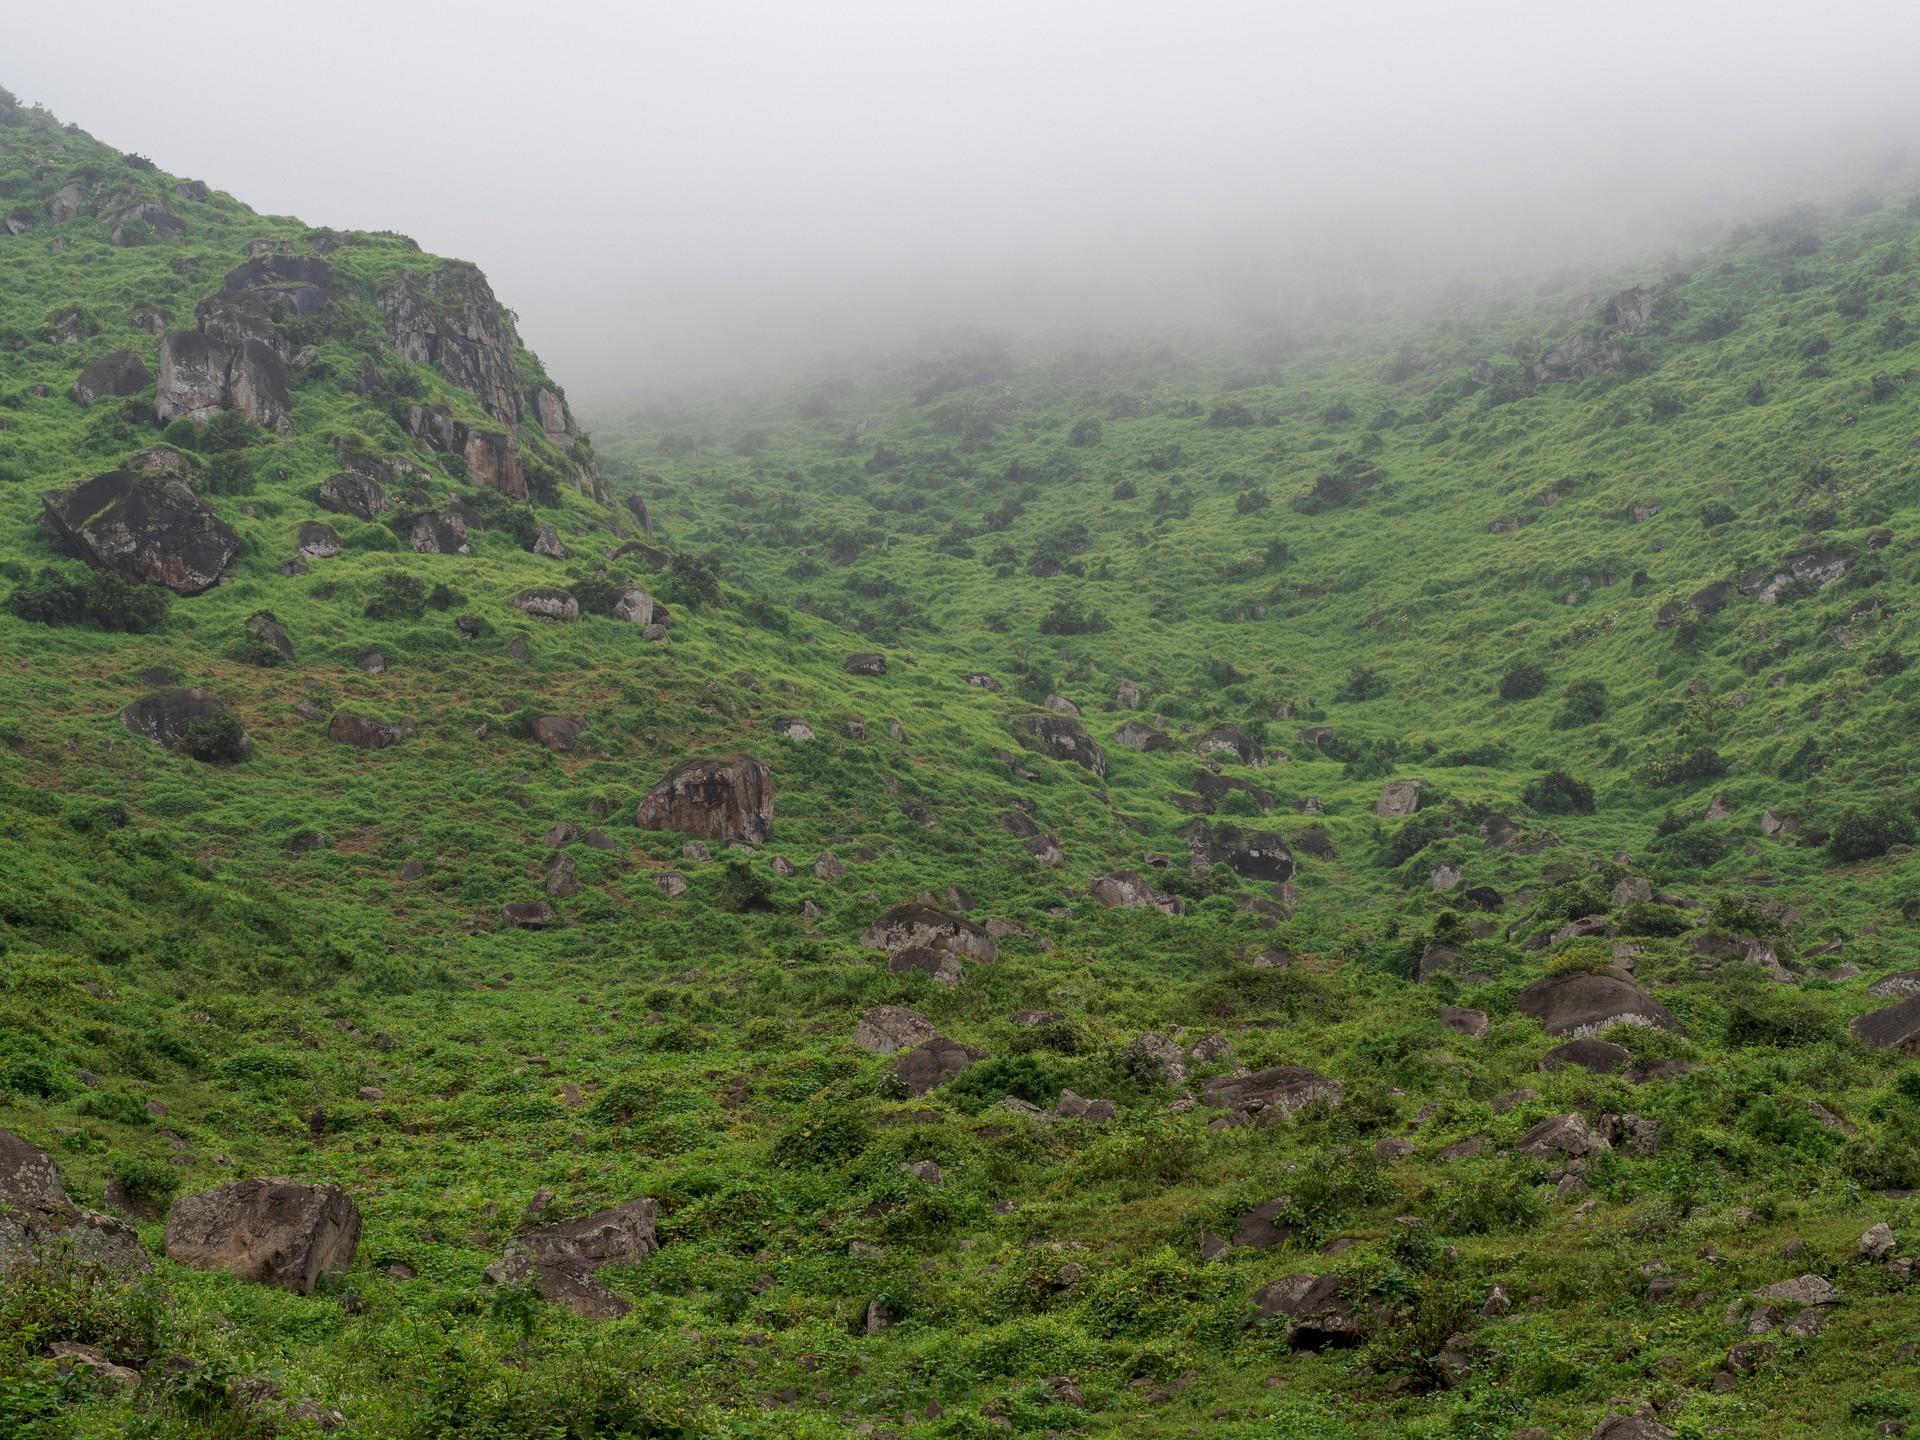 The misty hills of Lomas de Lucumo jut outside of Lima